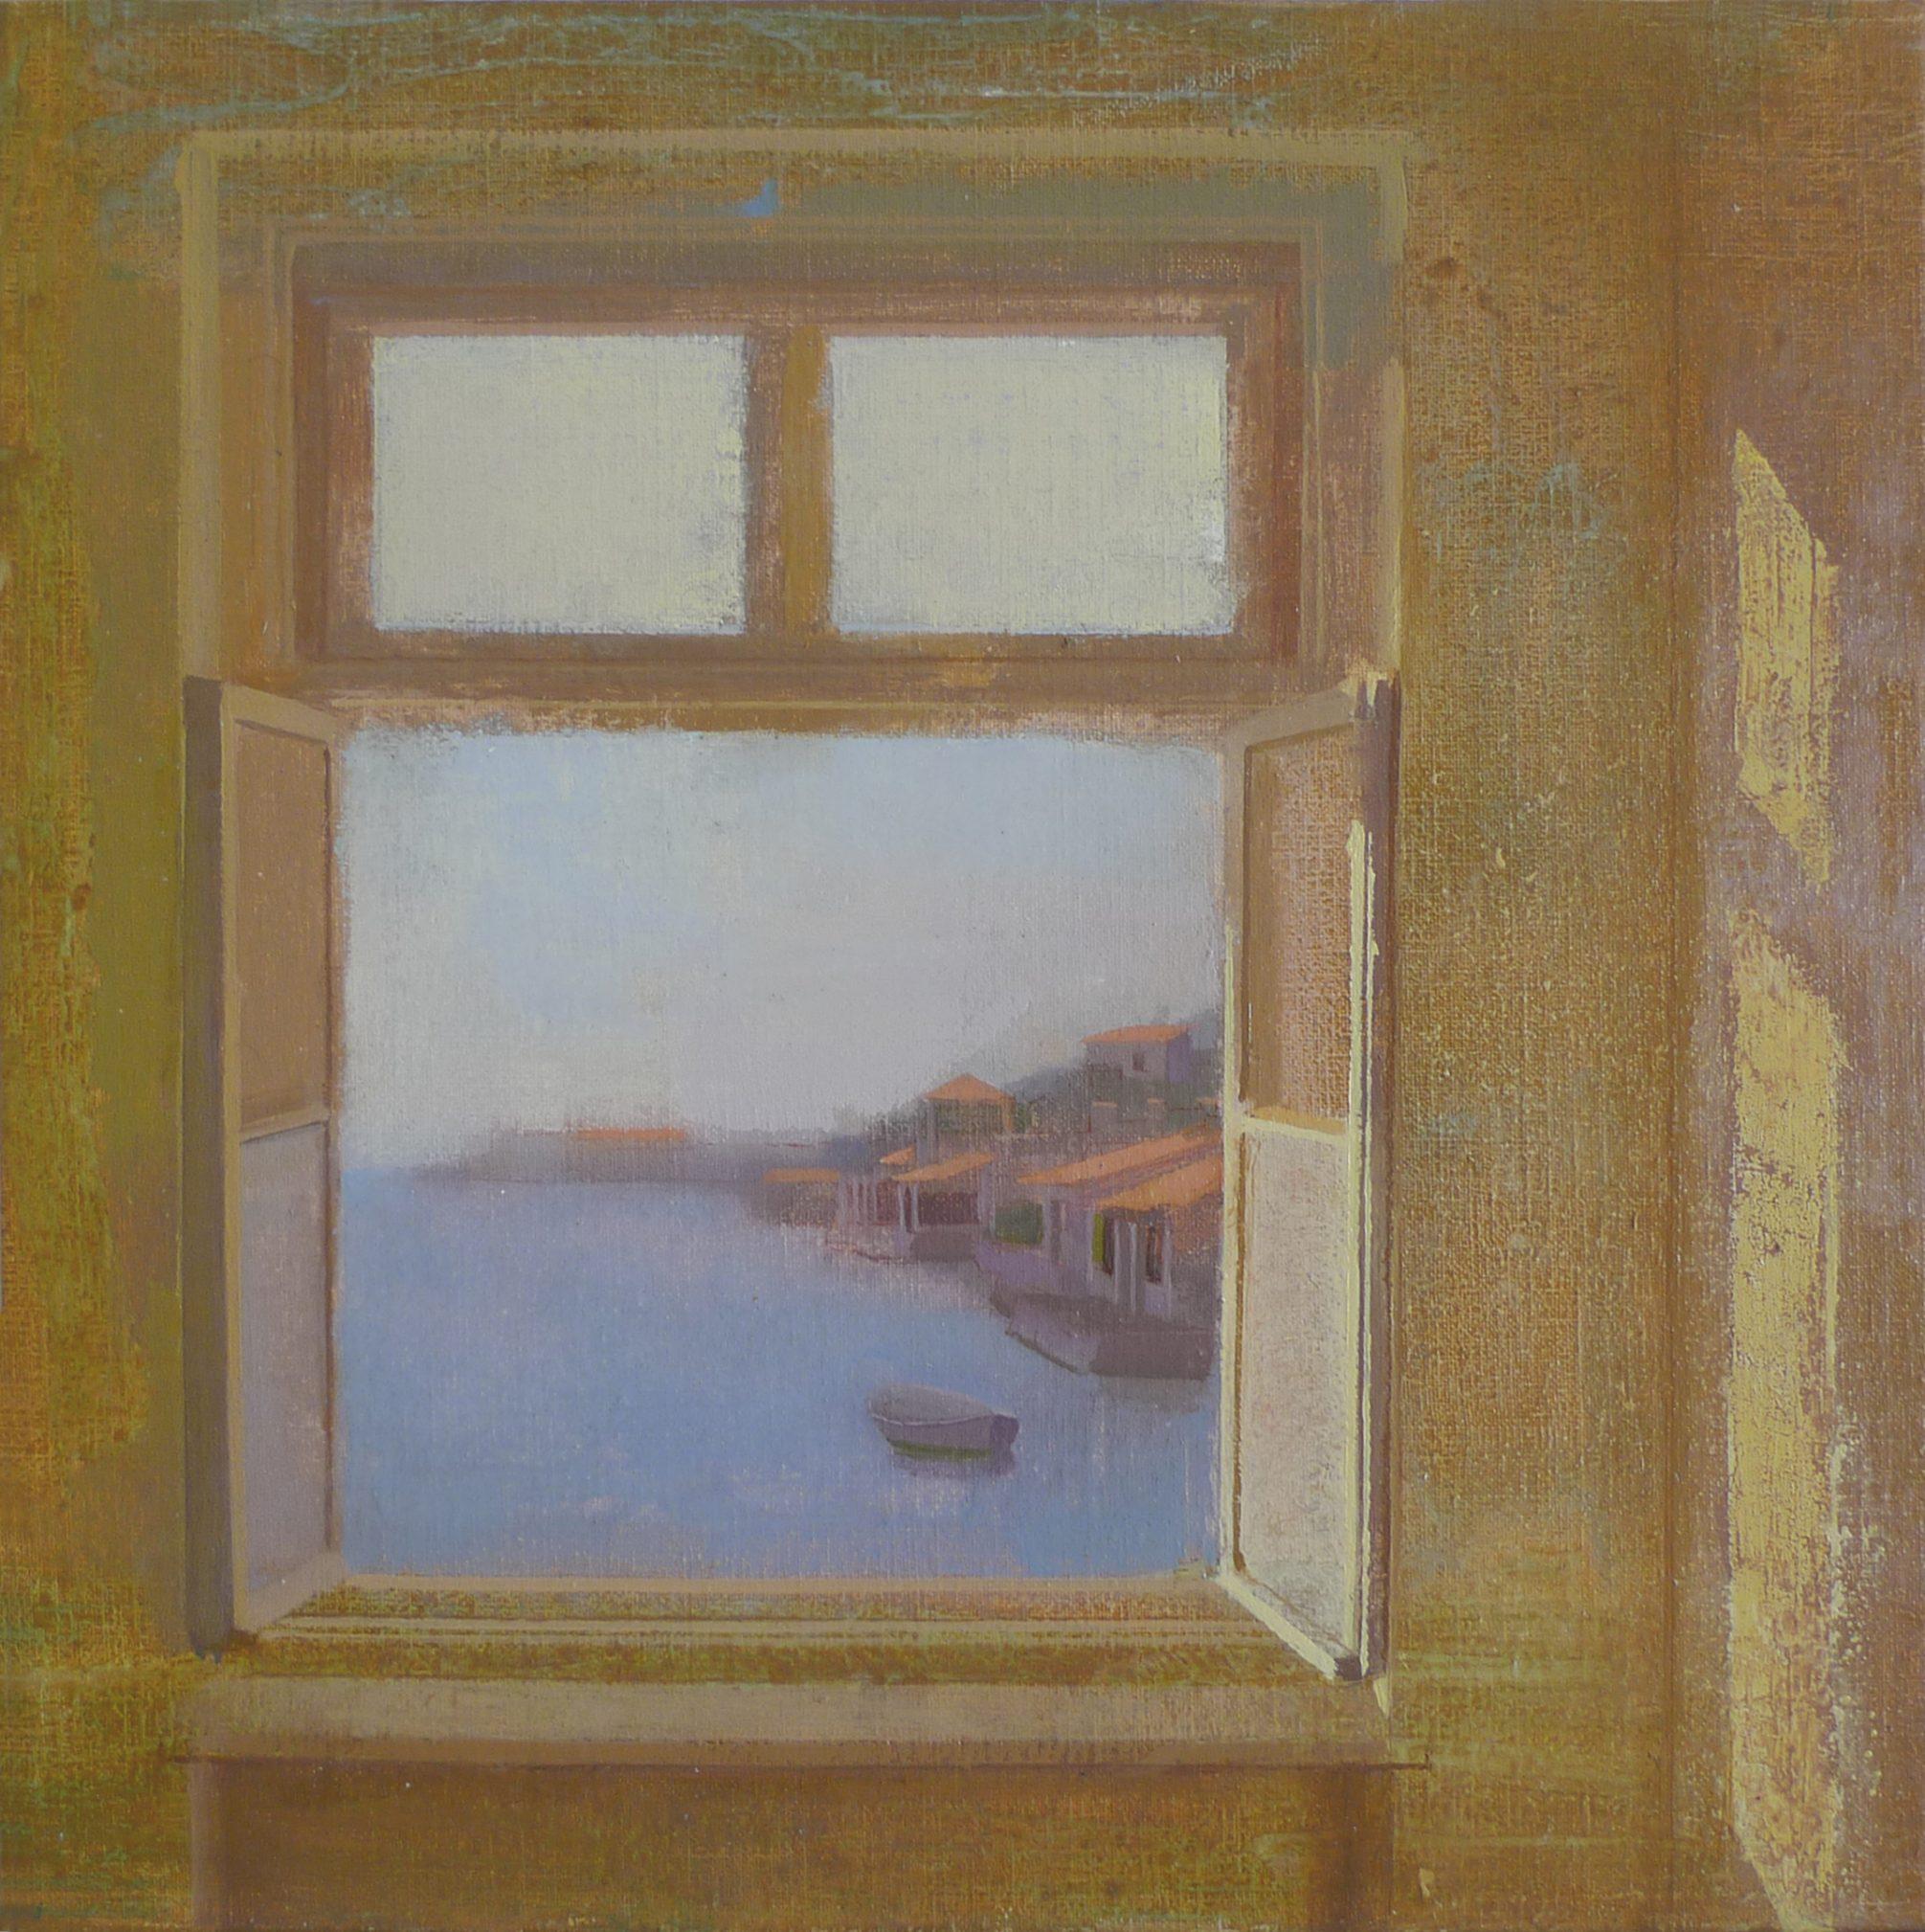 ventana-al-mar-menorca-alejandra-caballero-oleo-abierta-apaisaje-mar-luz-sol